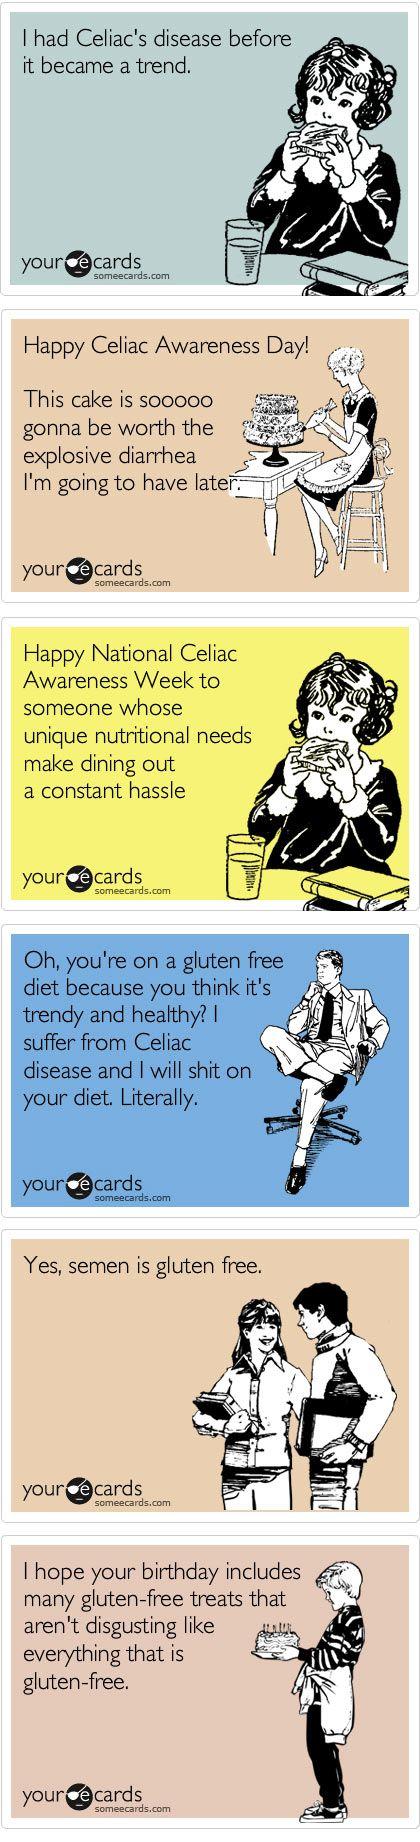 Funny gluten free ecards. Want more GF stuff? --> celiacglutenfreelife.com